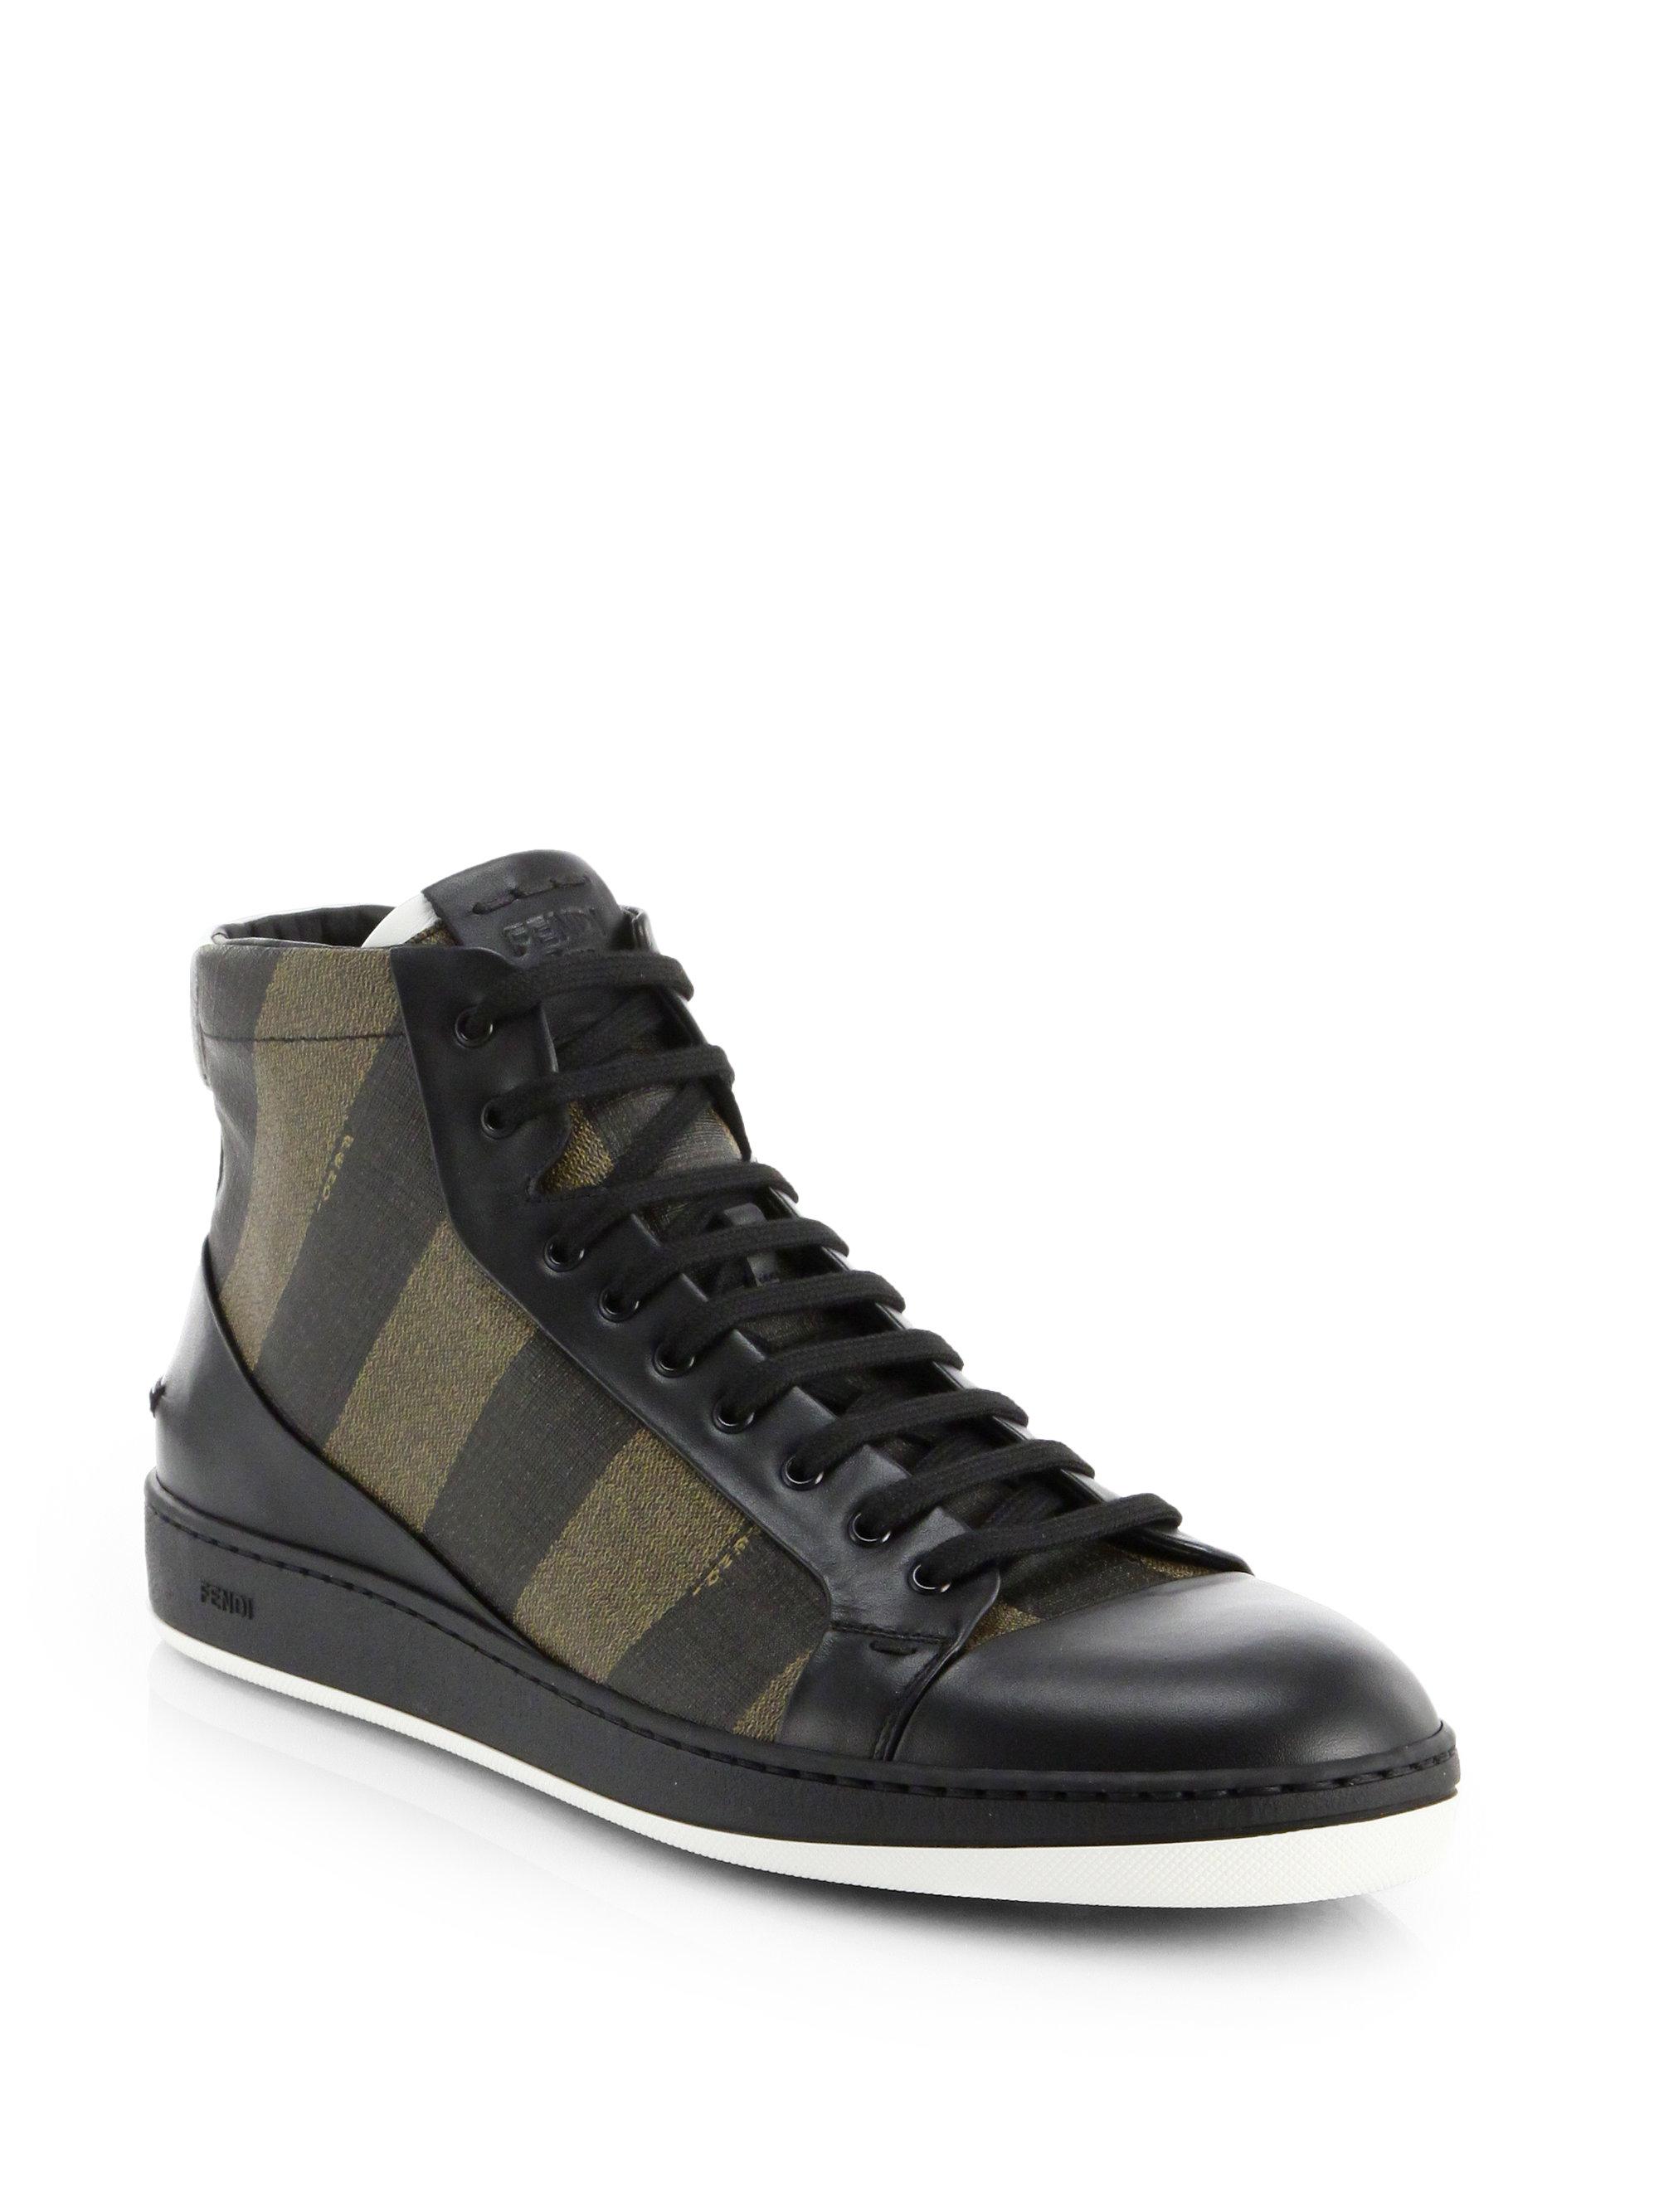 Fendi Mens Shoes Uk